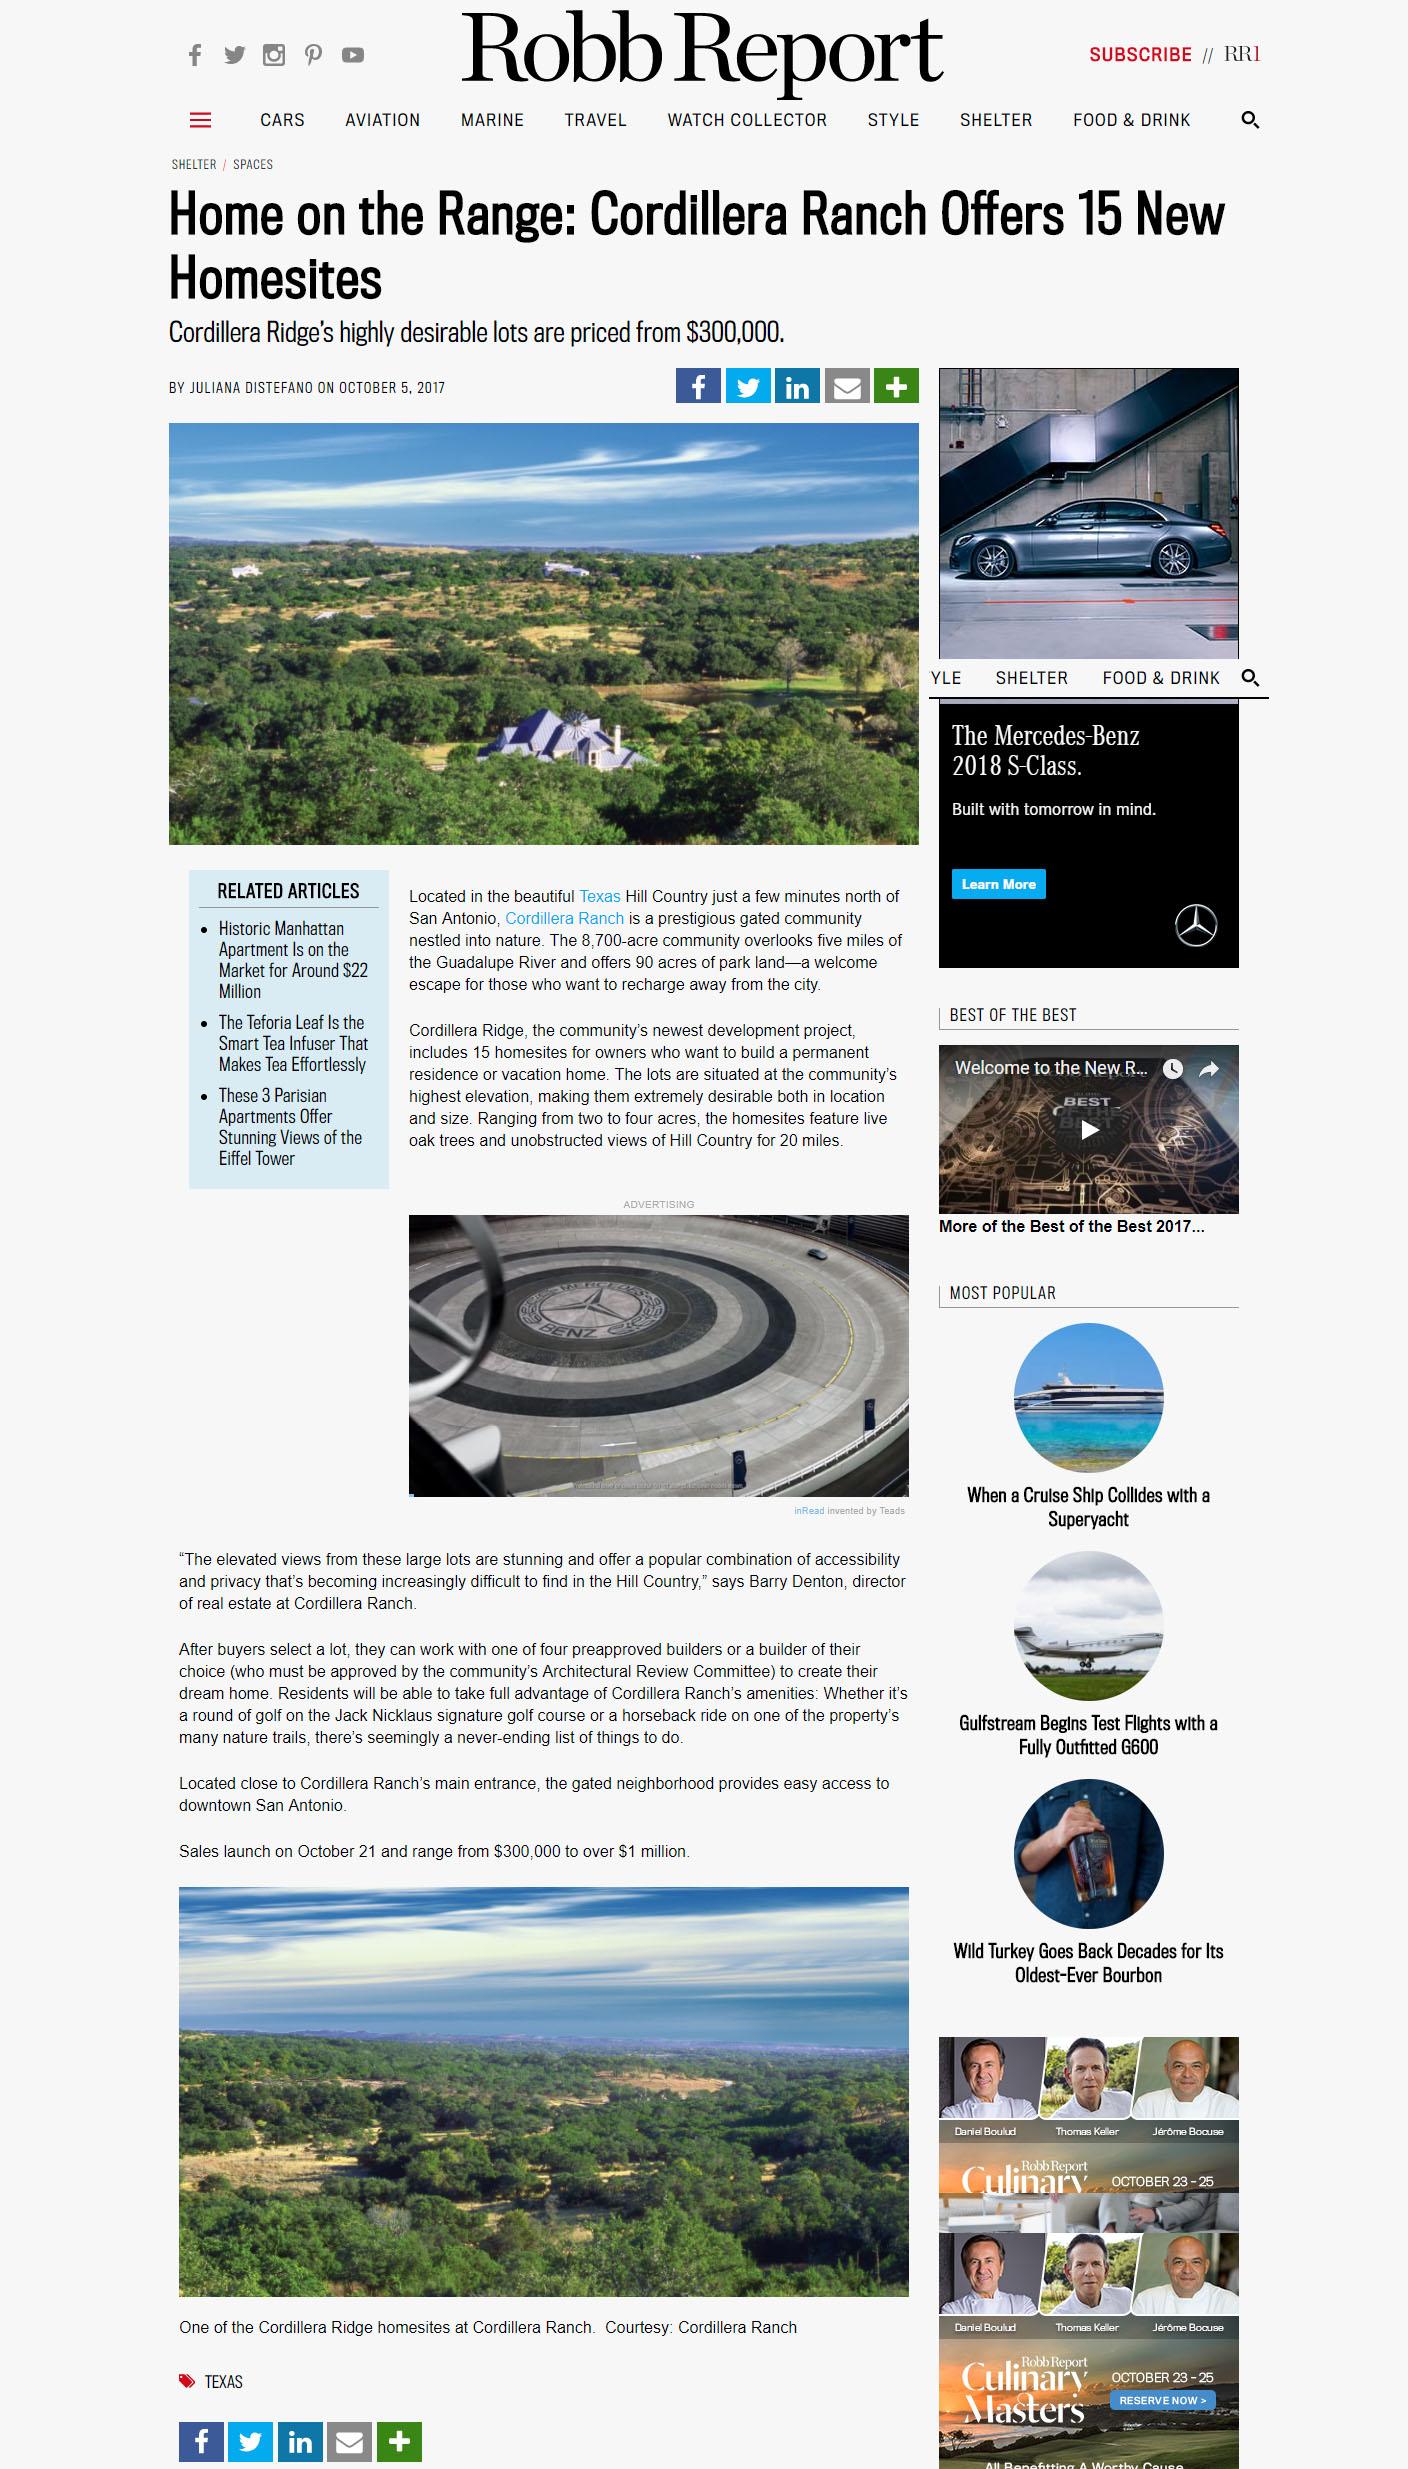 Robb Report, SABJ Spotlight Cordillera Ridge - Cordillera Ranch